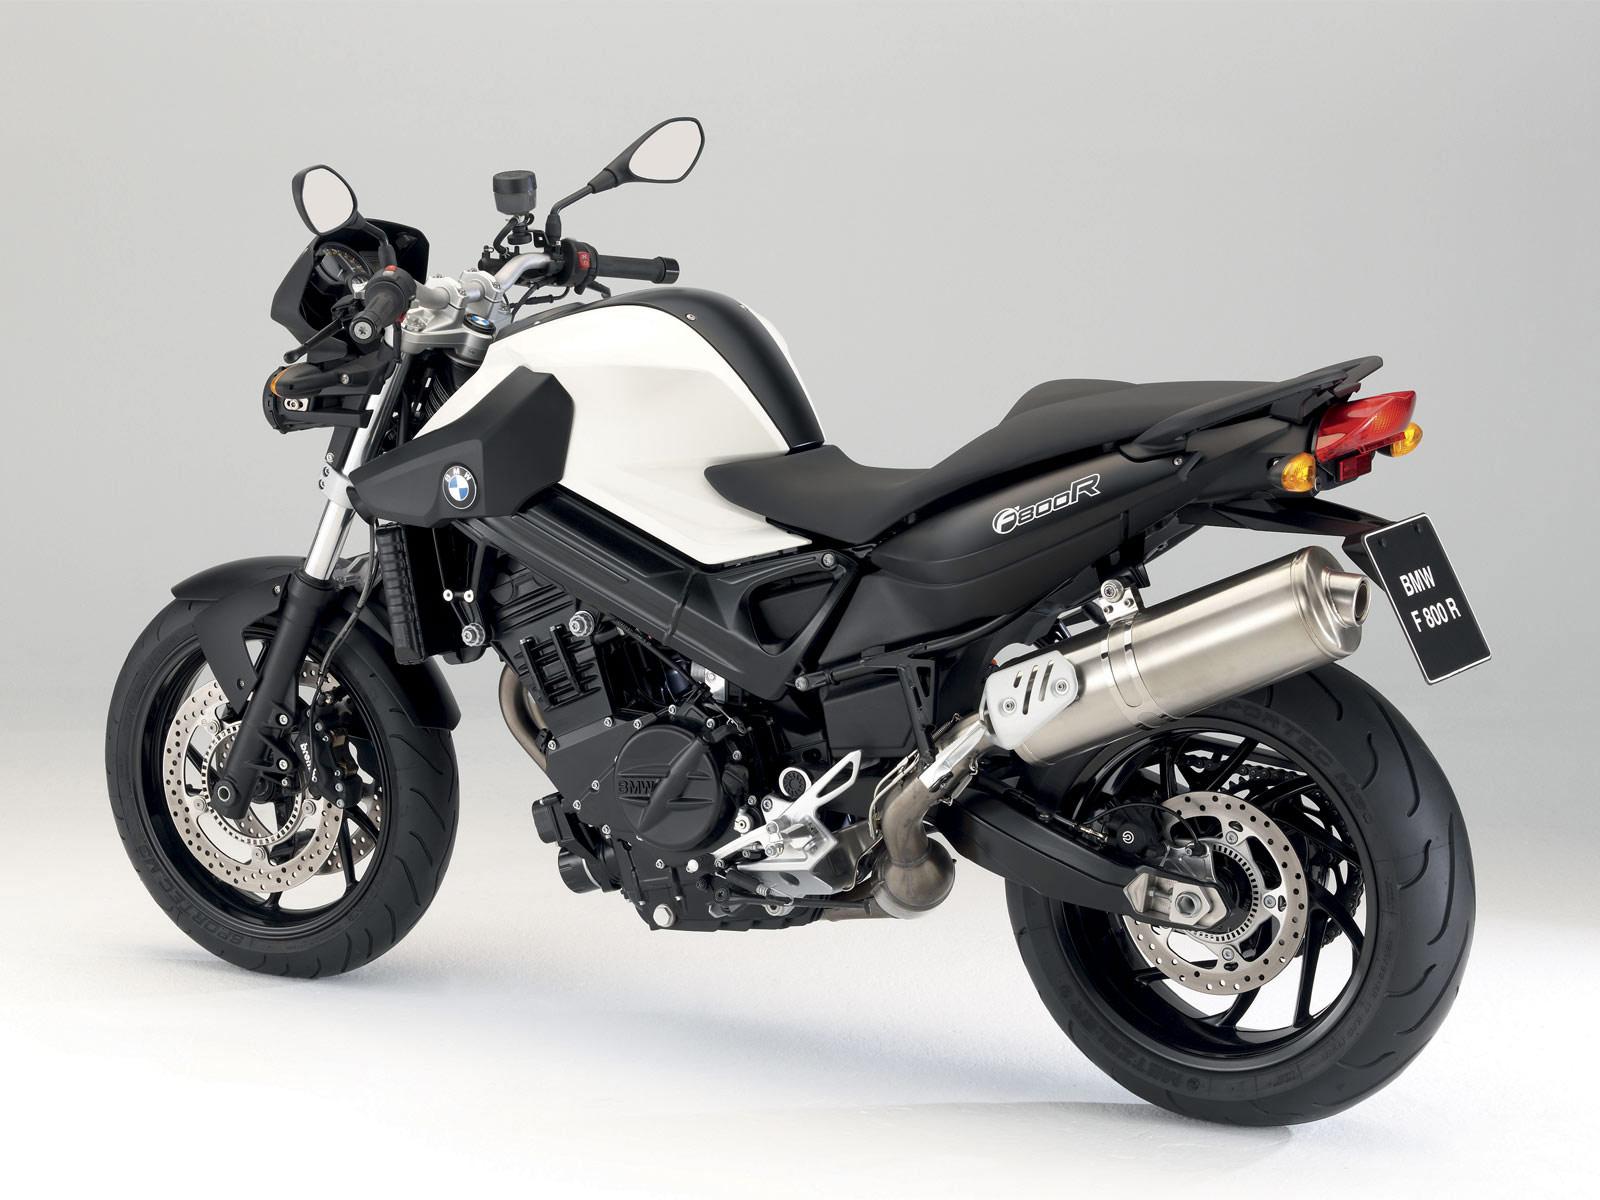 2008 bmw f 800 r motorcycle desktop wallpapers insurance. Black Bedroom Furniture Sets. Home Design Ideas